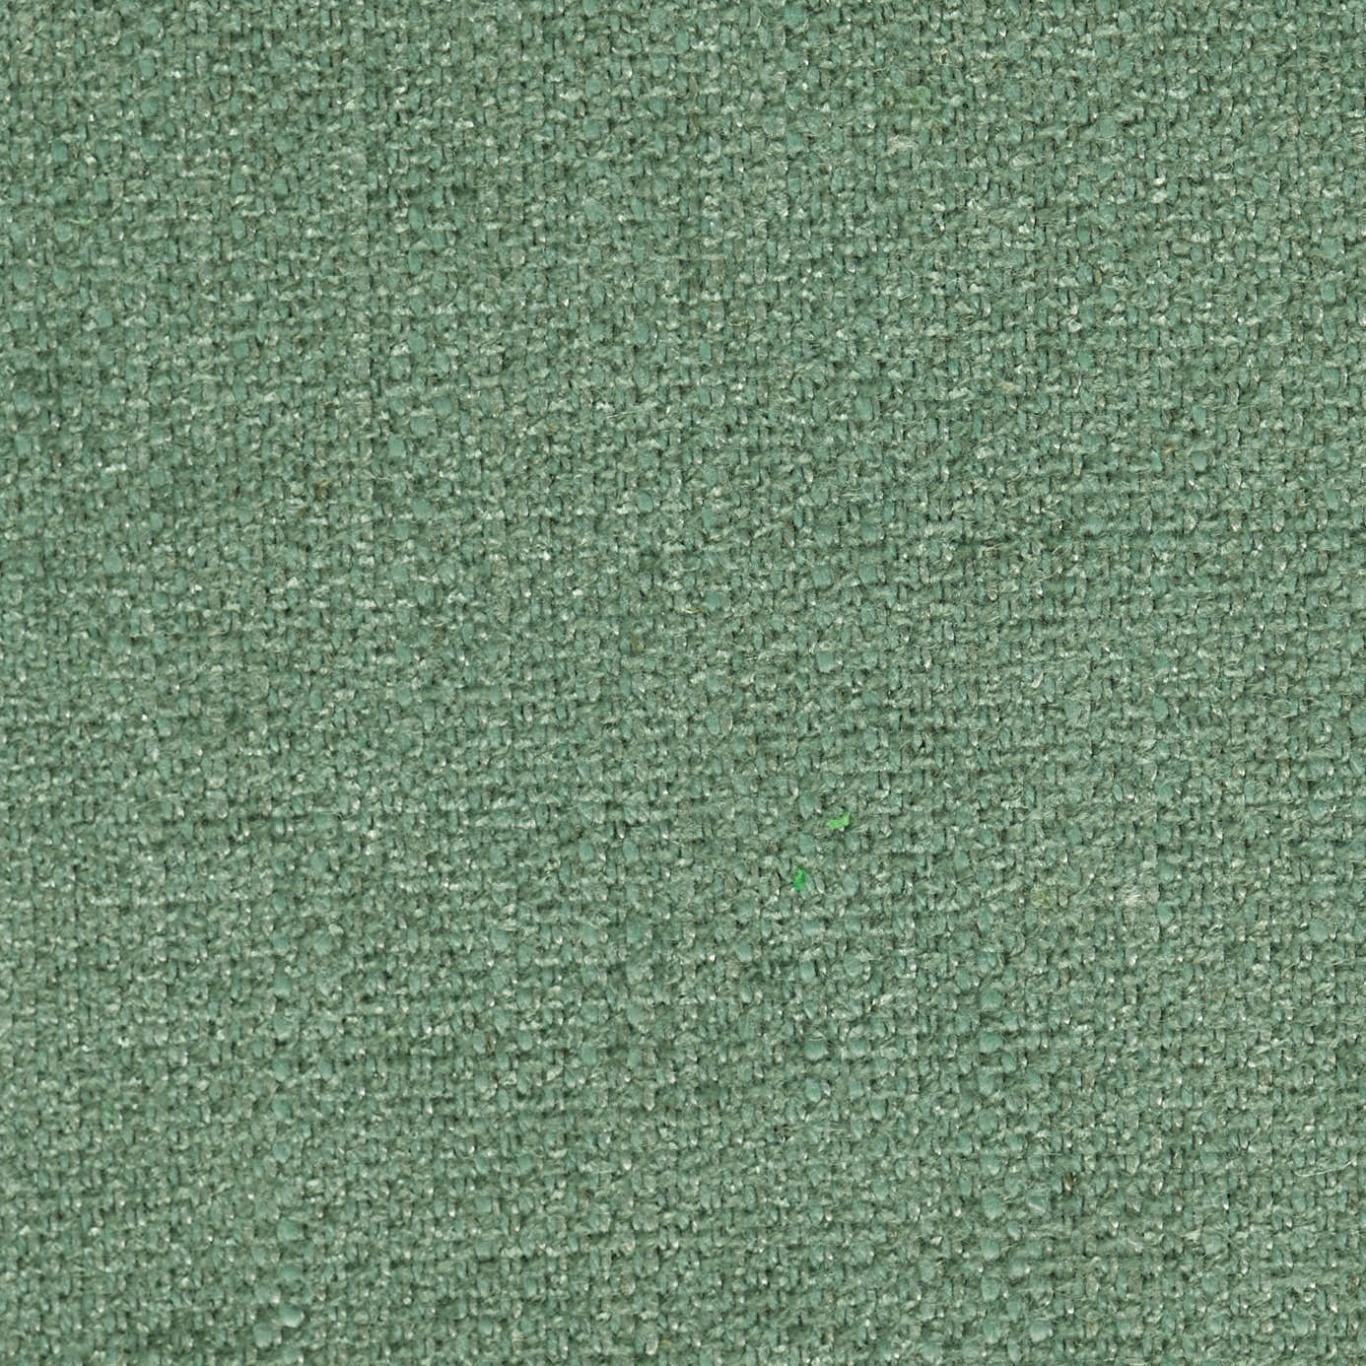 Image of Harlequin Molecule Sage Fabric 440183